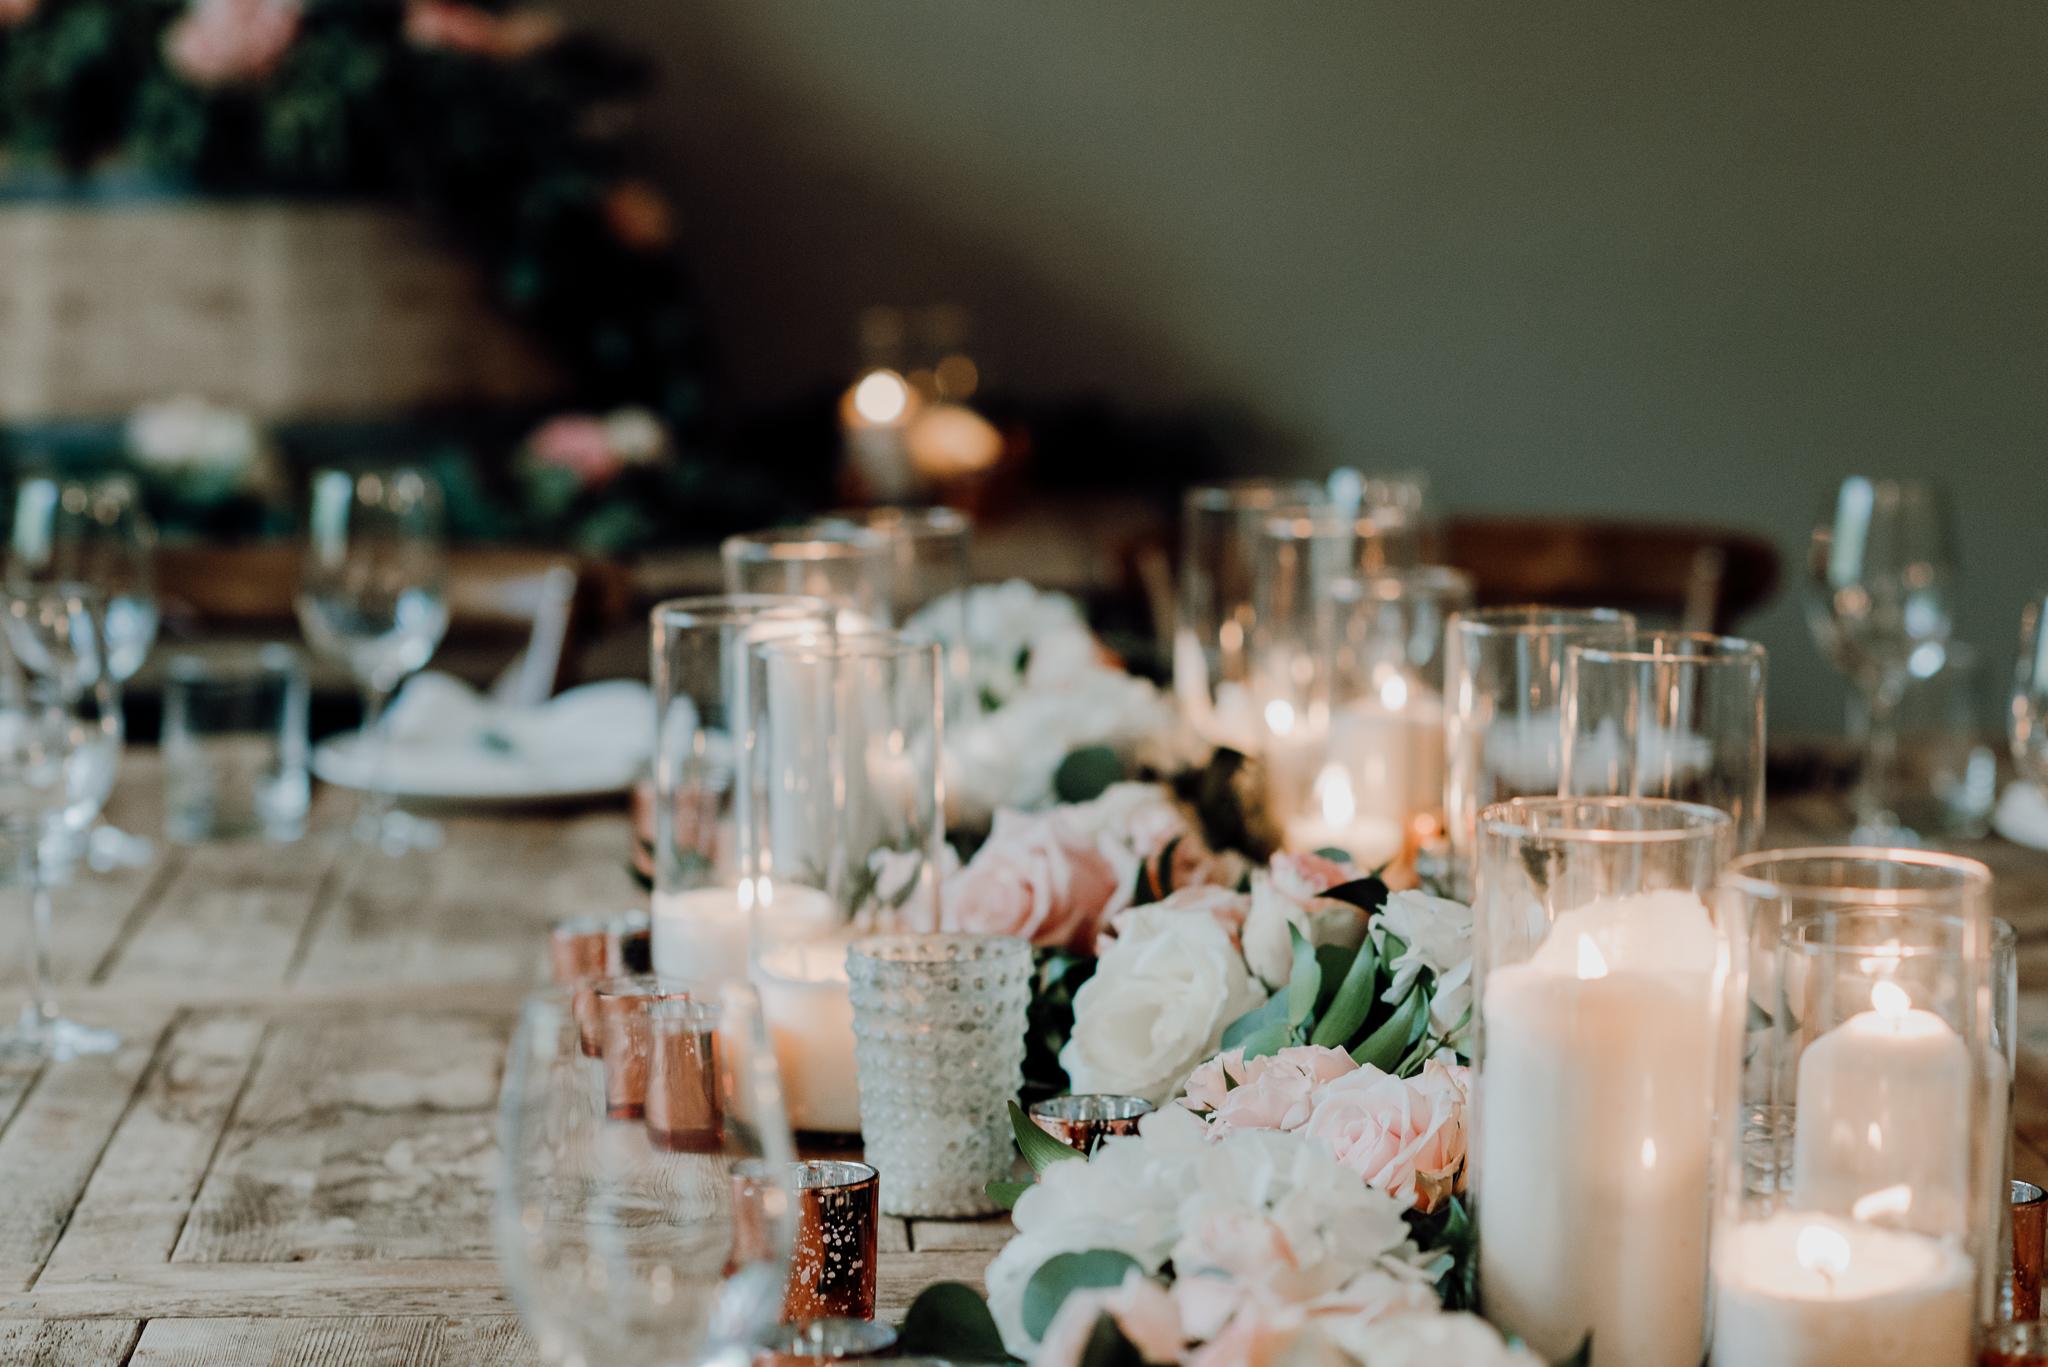 kristen giles photography | texas-wedding-elopement-photographer-Duchman Winery-Austin TX-9-blog.jpg